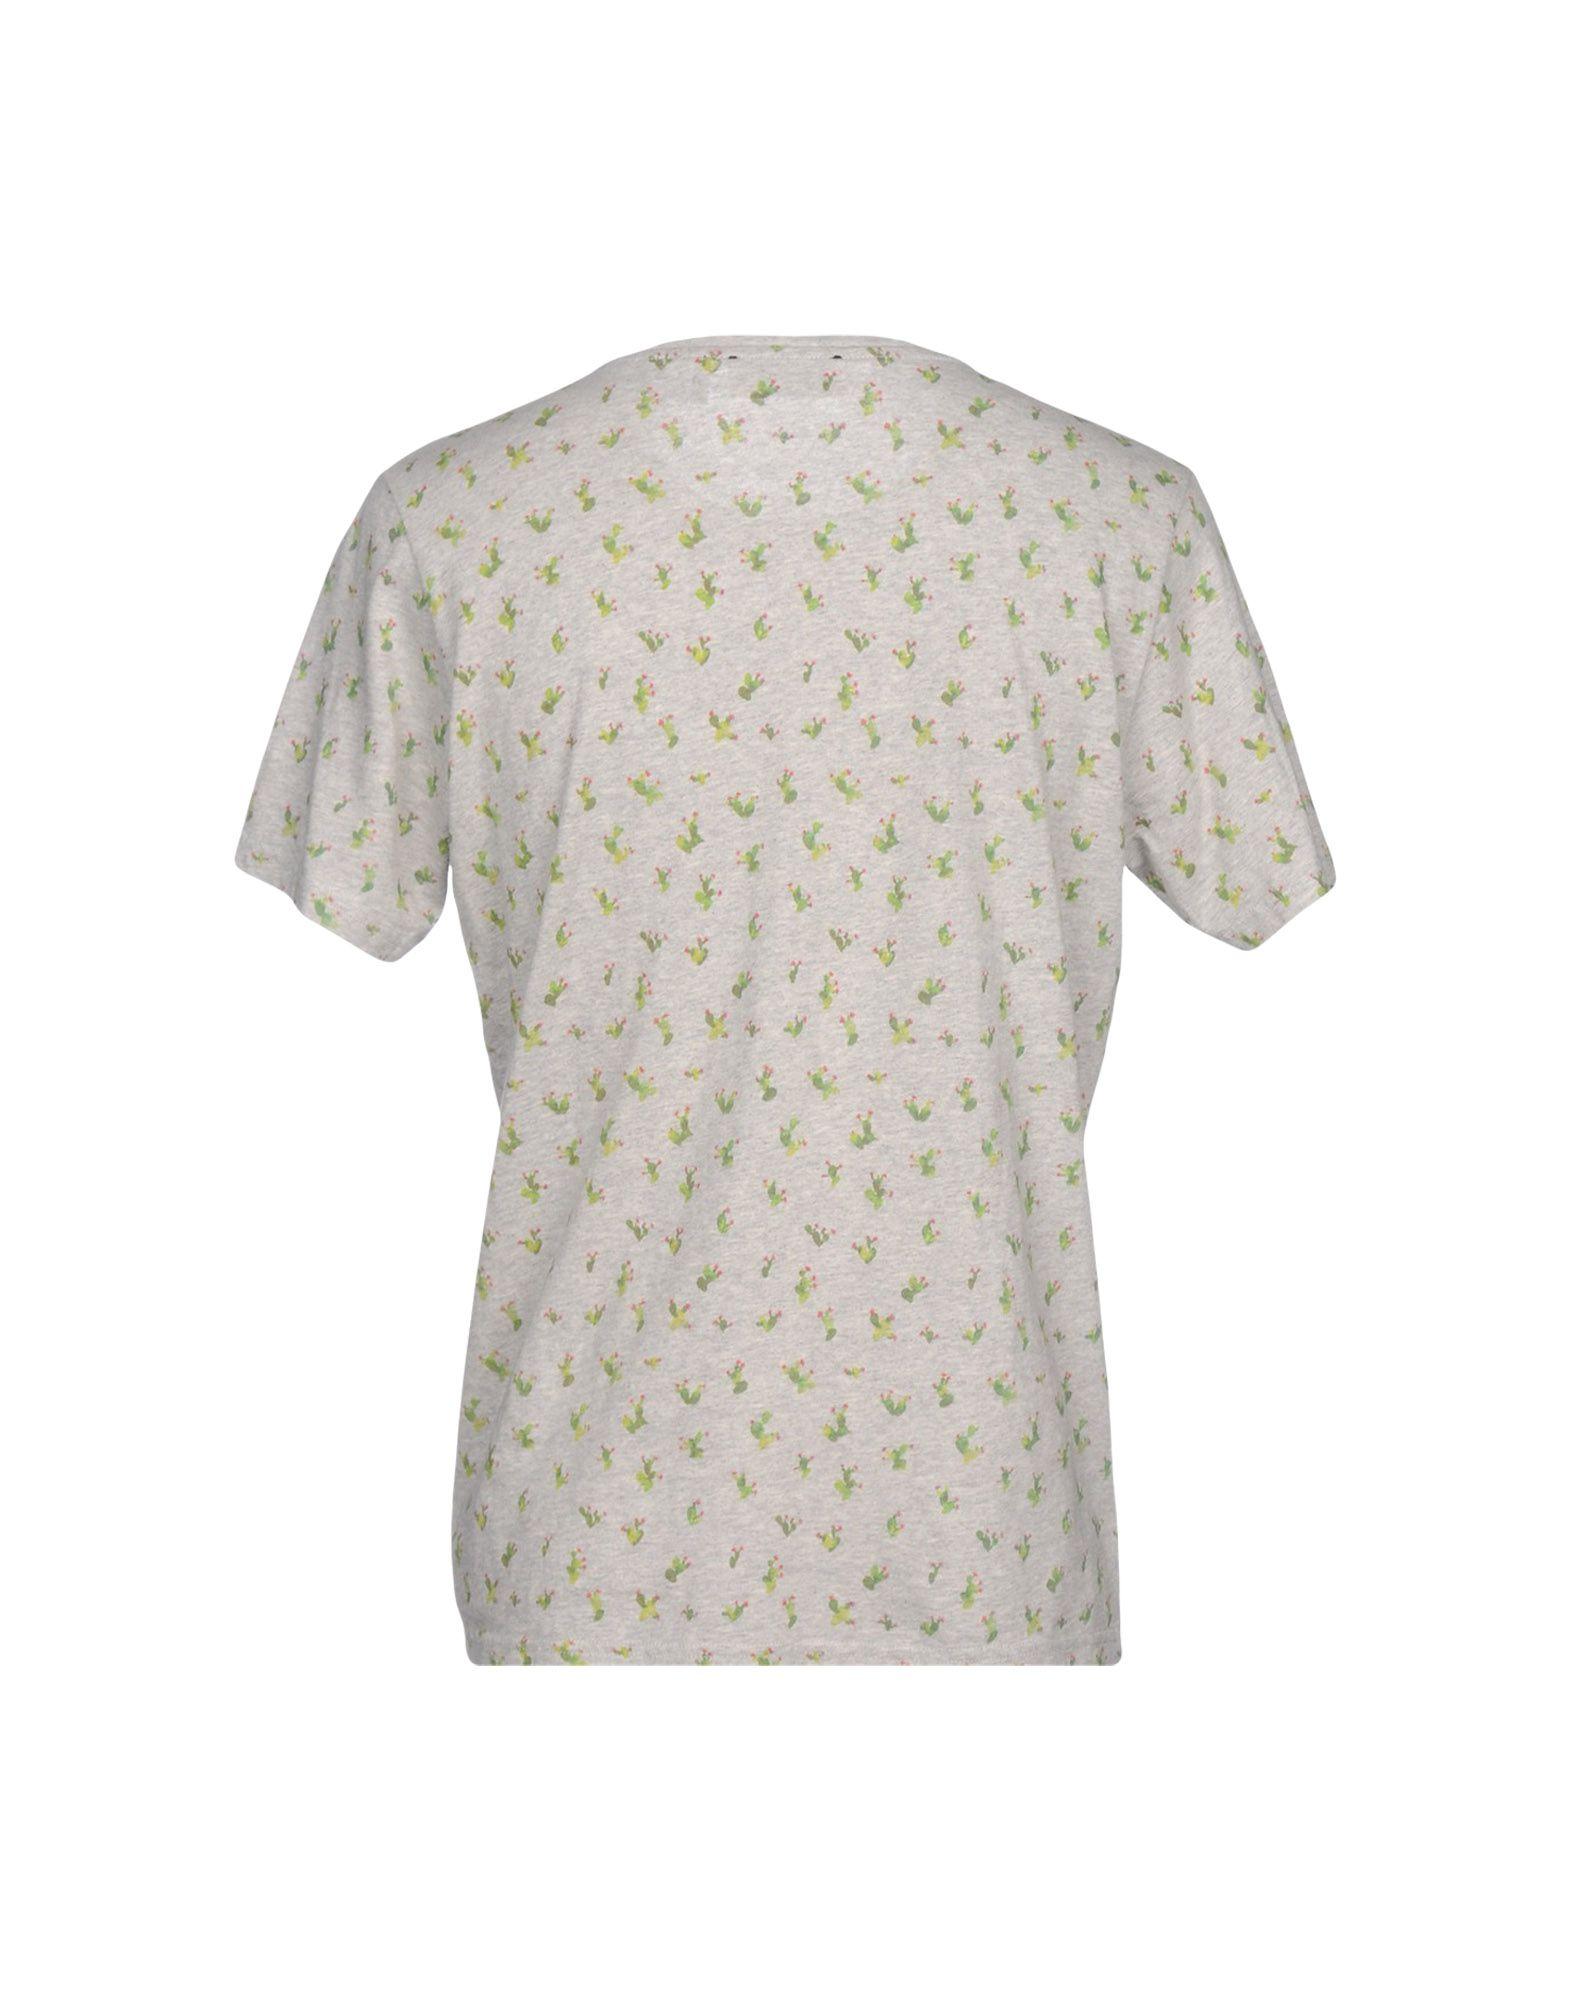 T-Shirt T-Shirt T-Shirt Essentiel Antwerp Uomo - 12155022SG 640fa1